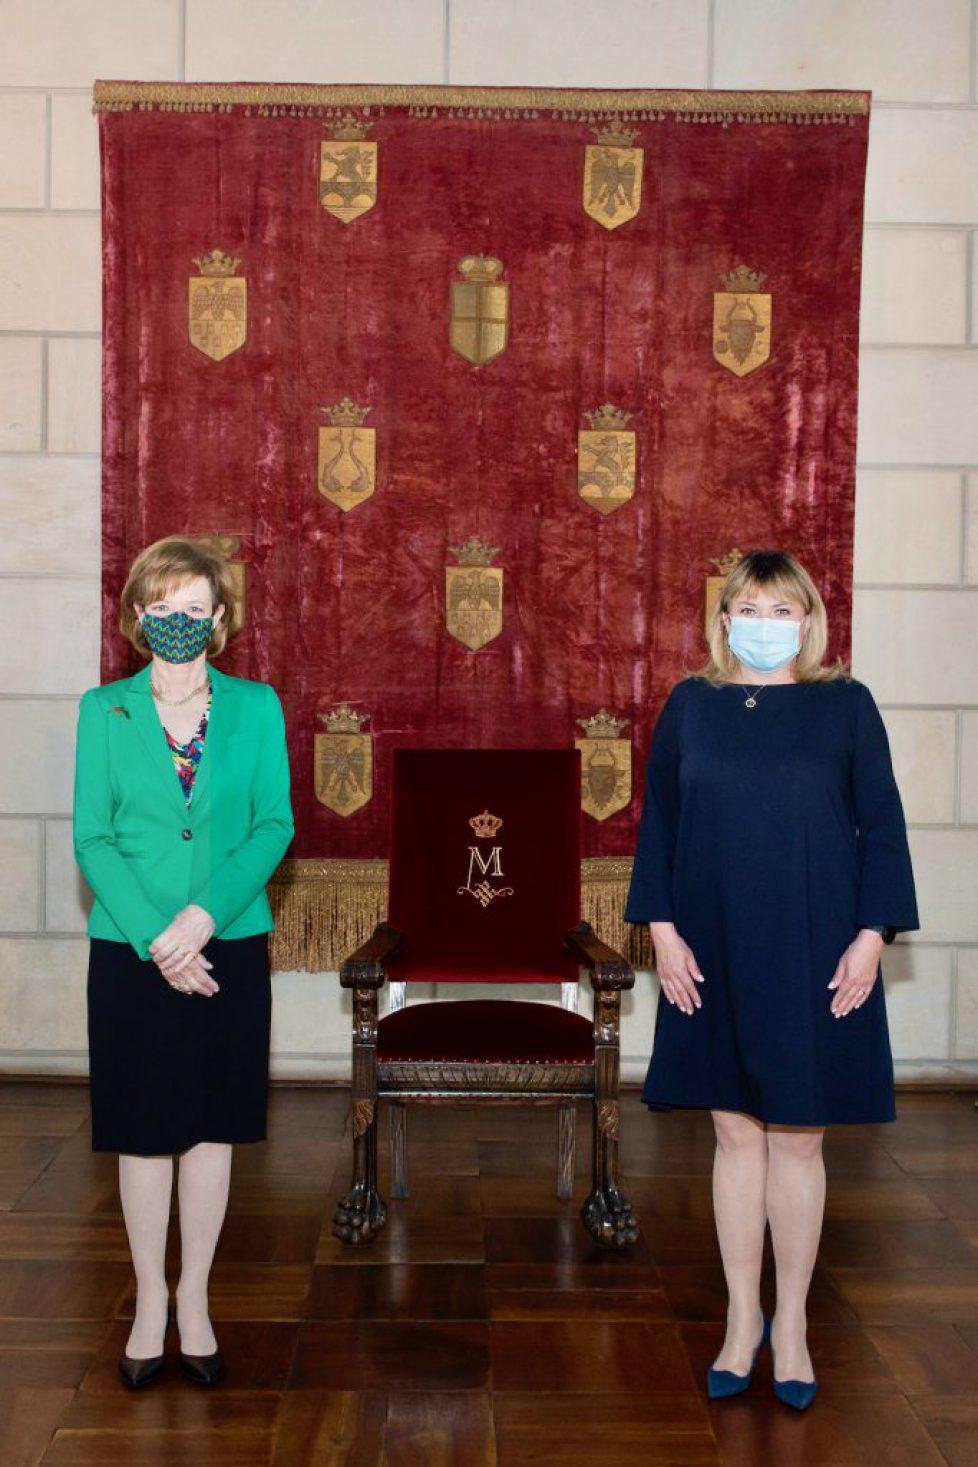 Majestatea-Sa-Margareta-Custodele-Coroaneii-Anca-Dragu-Presedinta-Senatului-Romaniei-Palatul-Elisabeta